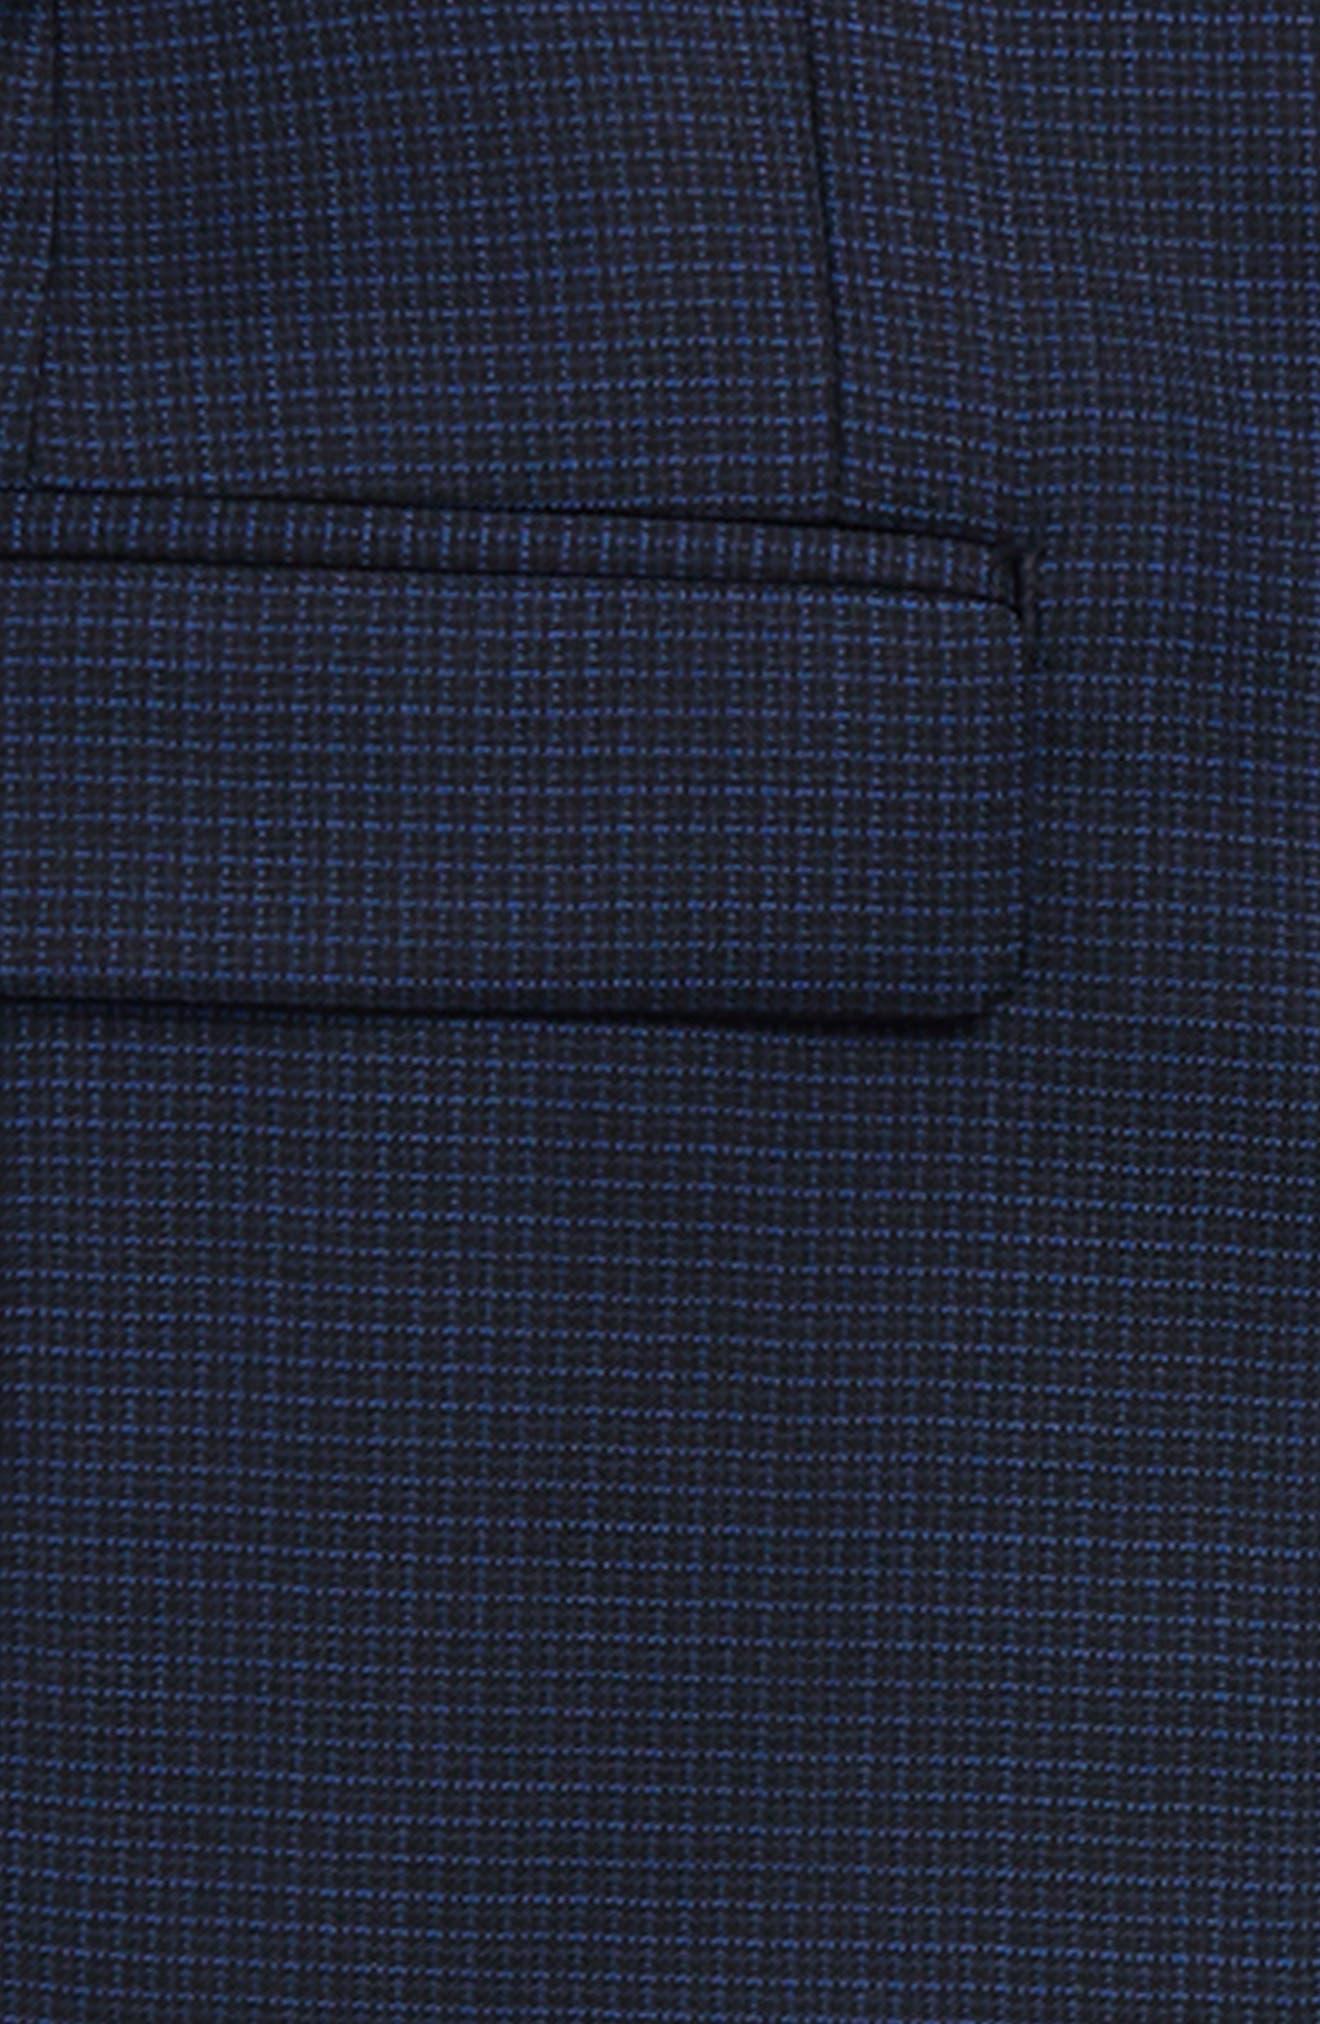 Mini Grid Wool Suit,                             Alternate thumbnail 2, color,                             BLACK/ BLUE